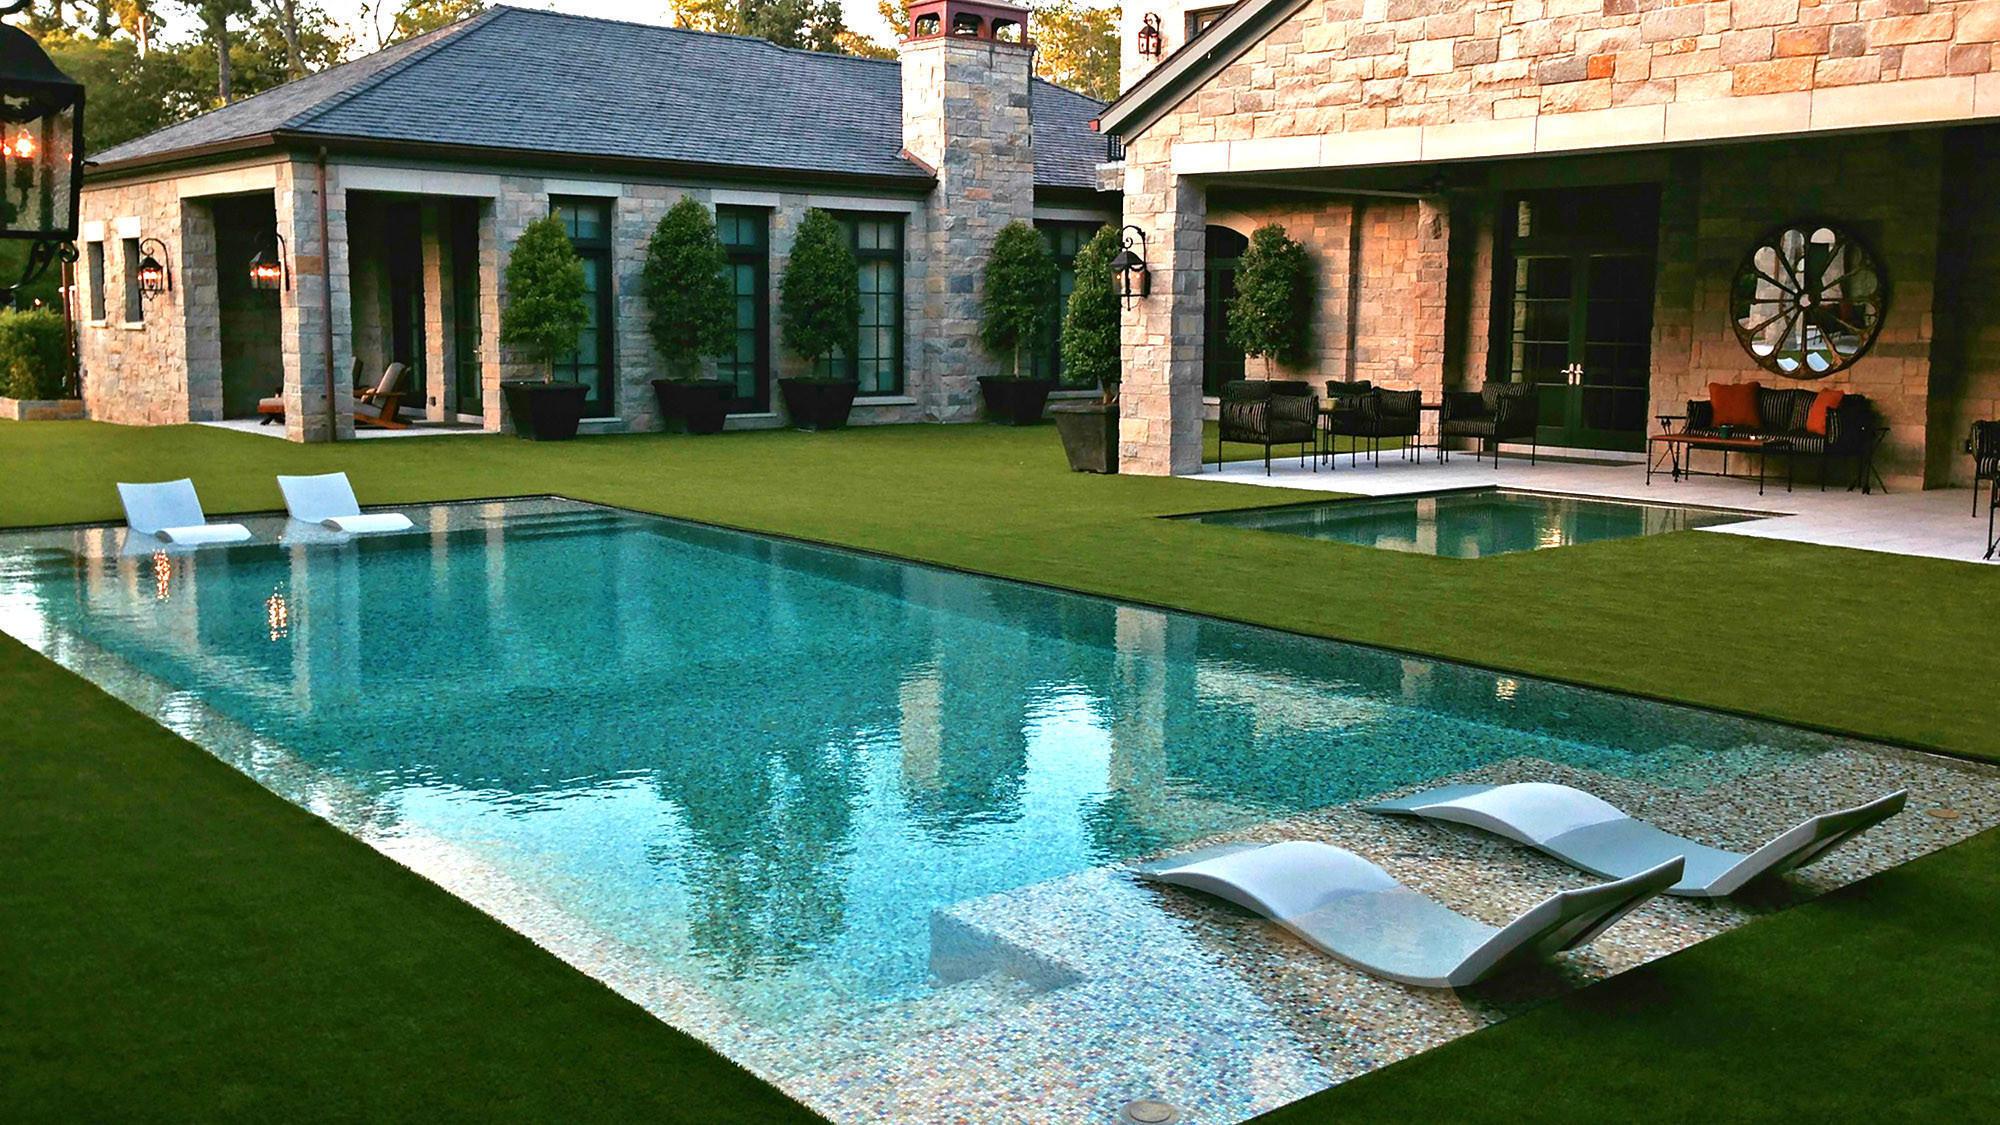 Grass Edge Peekaboo Refresh Your Backyard With The